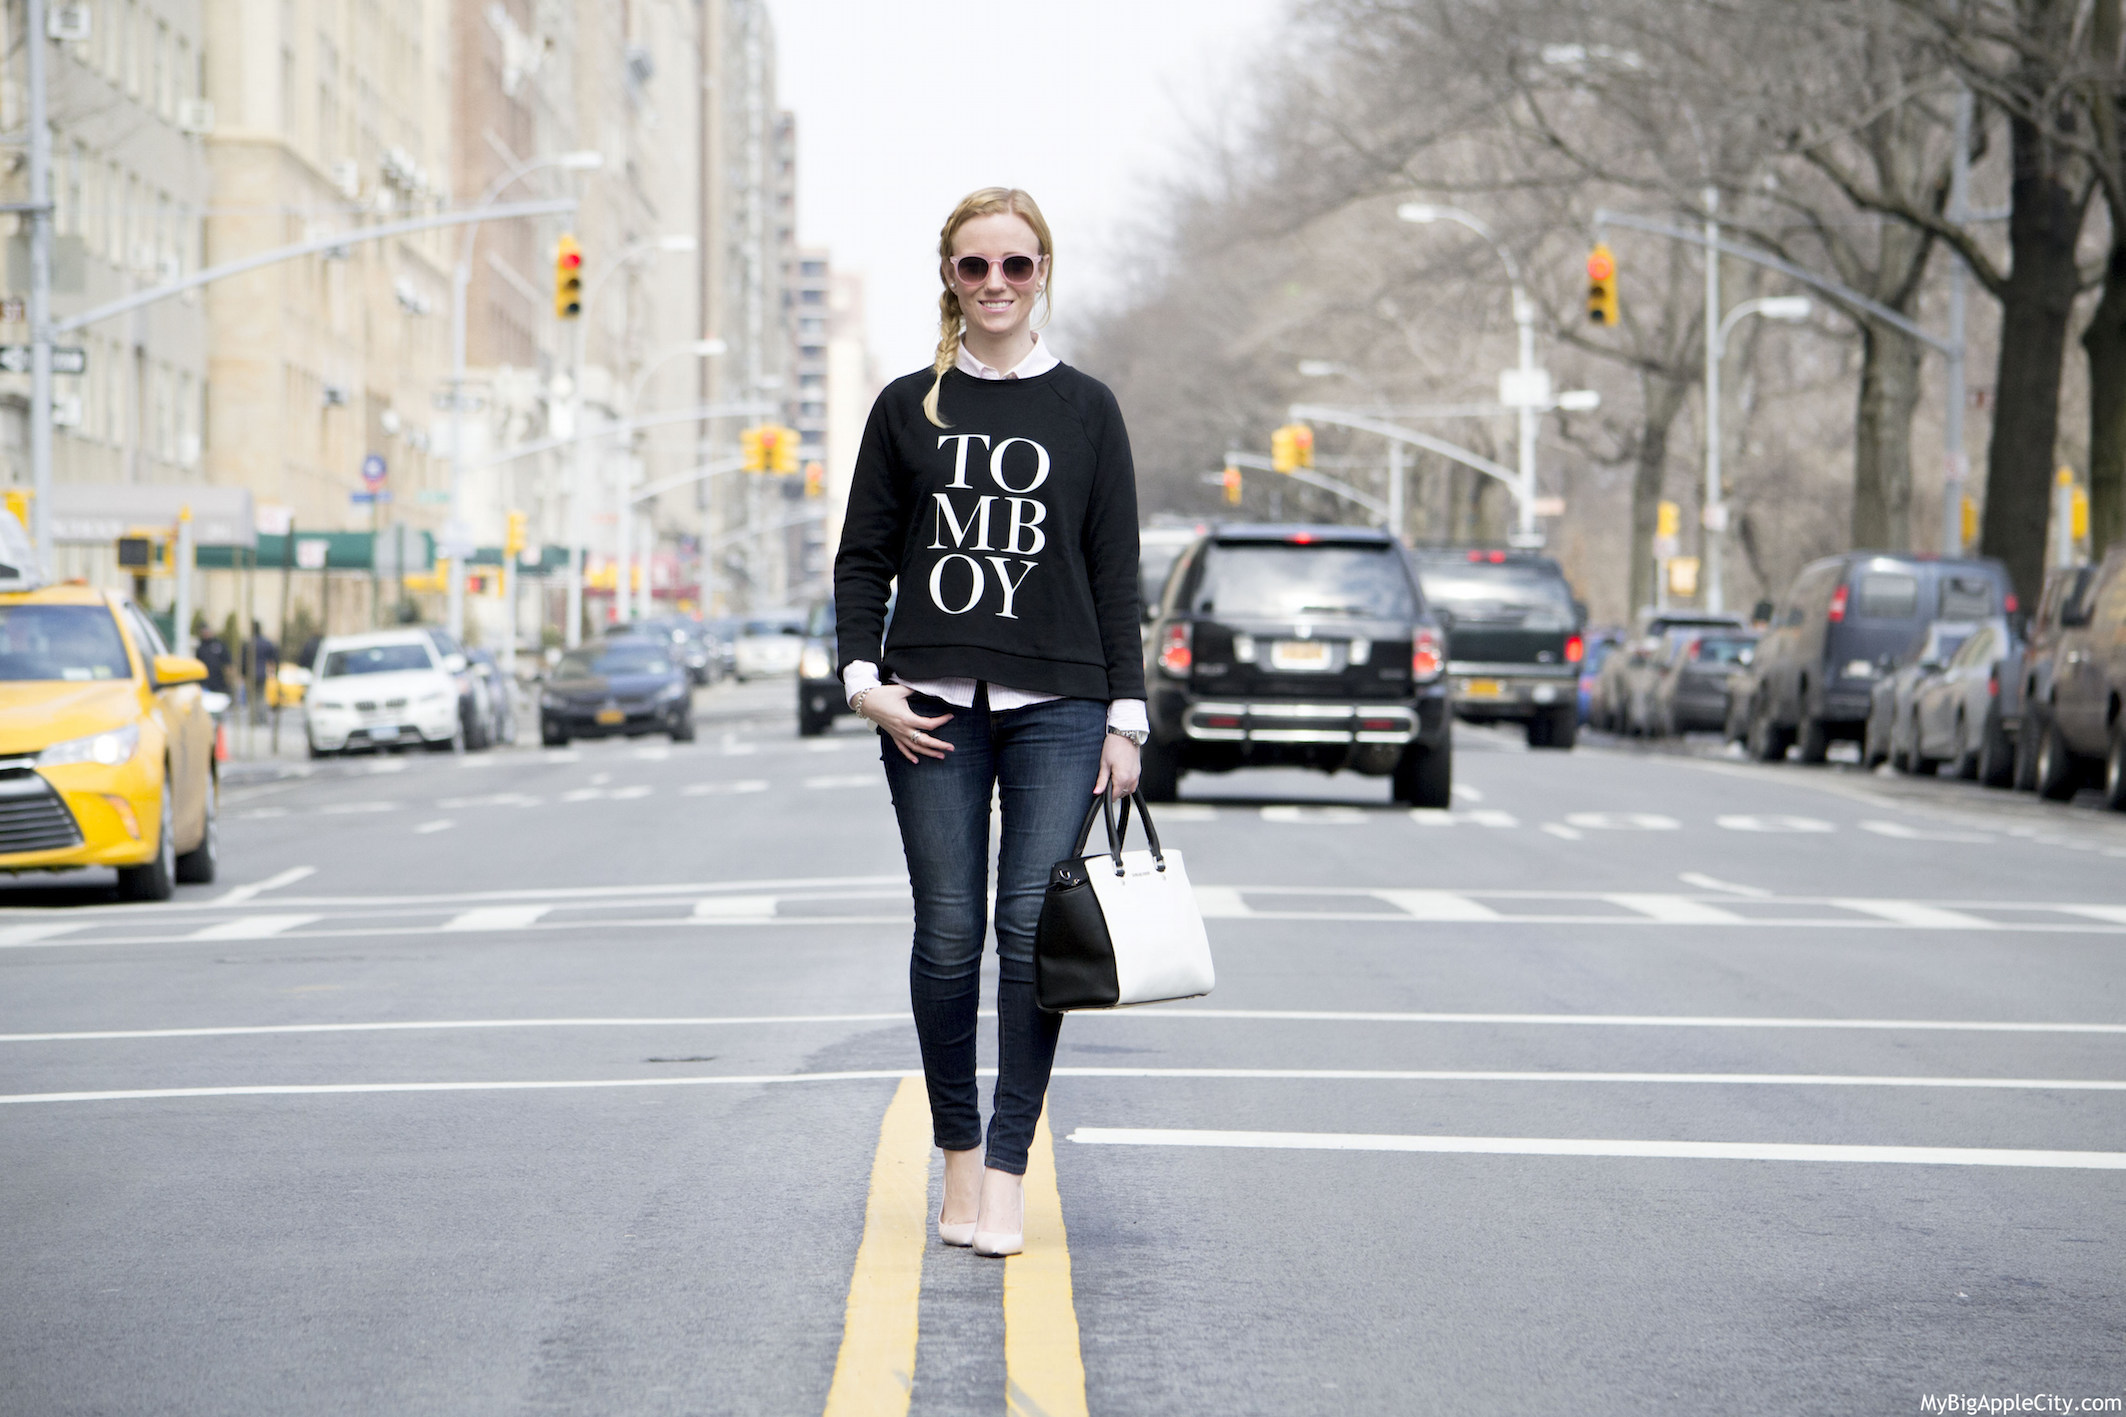 New-York-Streetstyle-Fashion-blogger-MyBigAppleCity